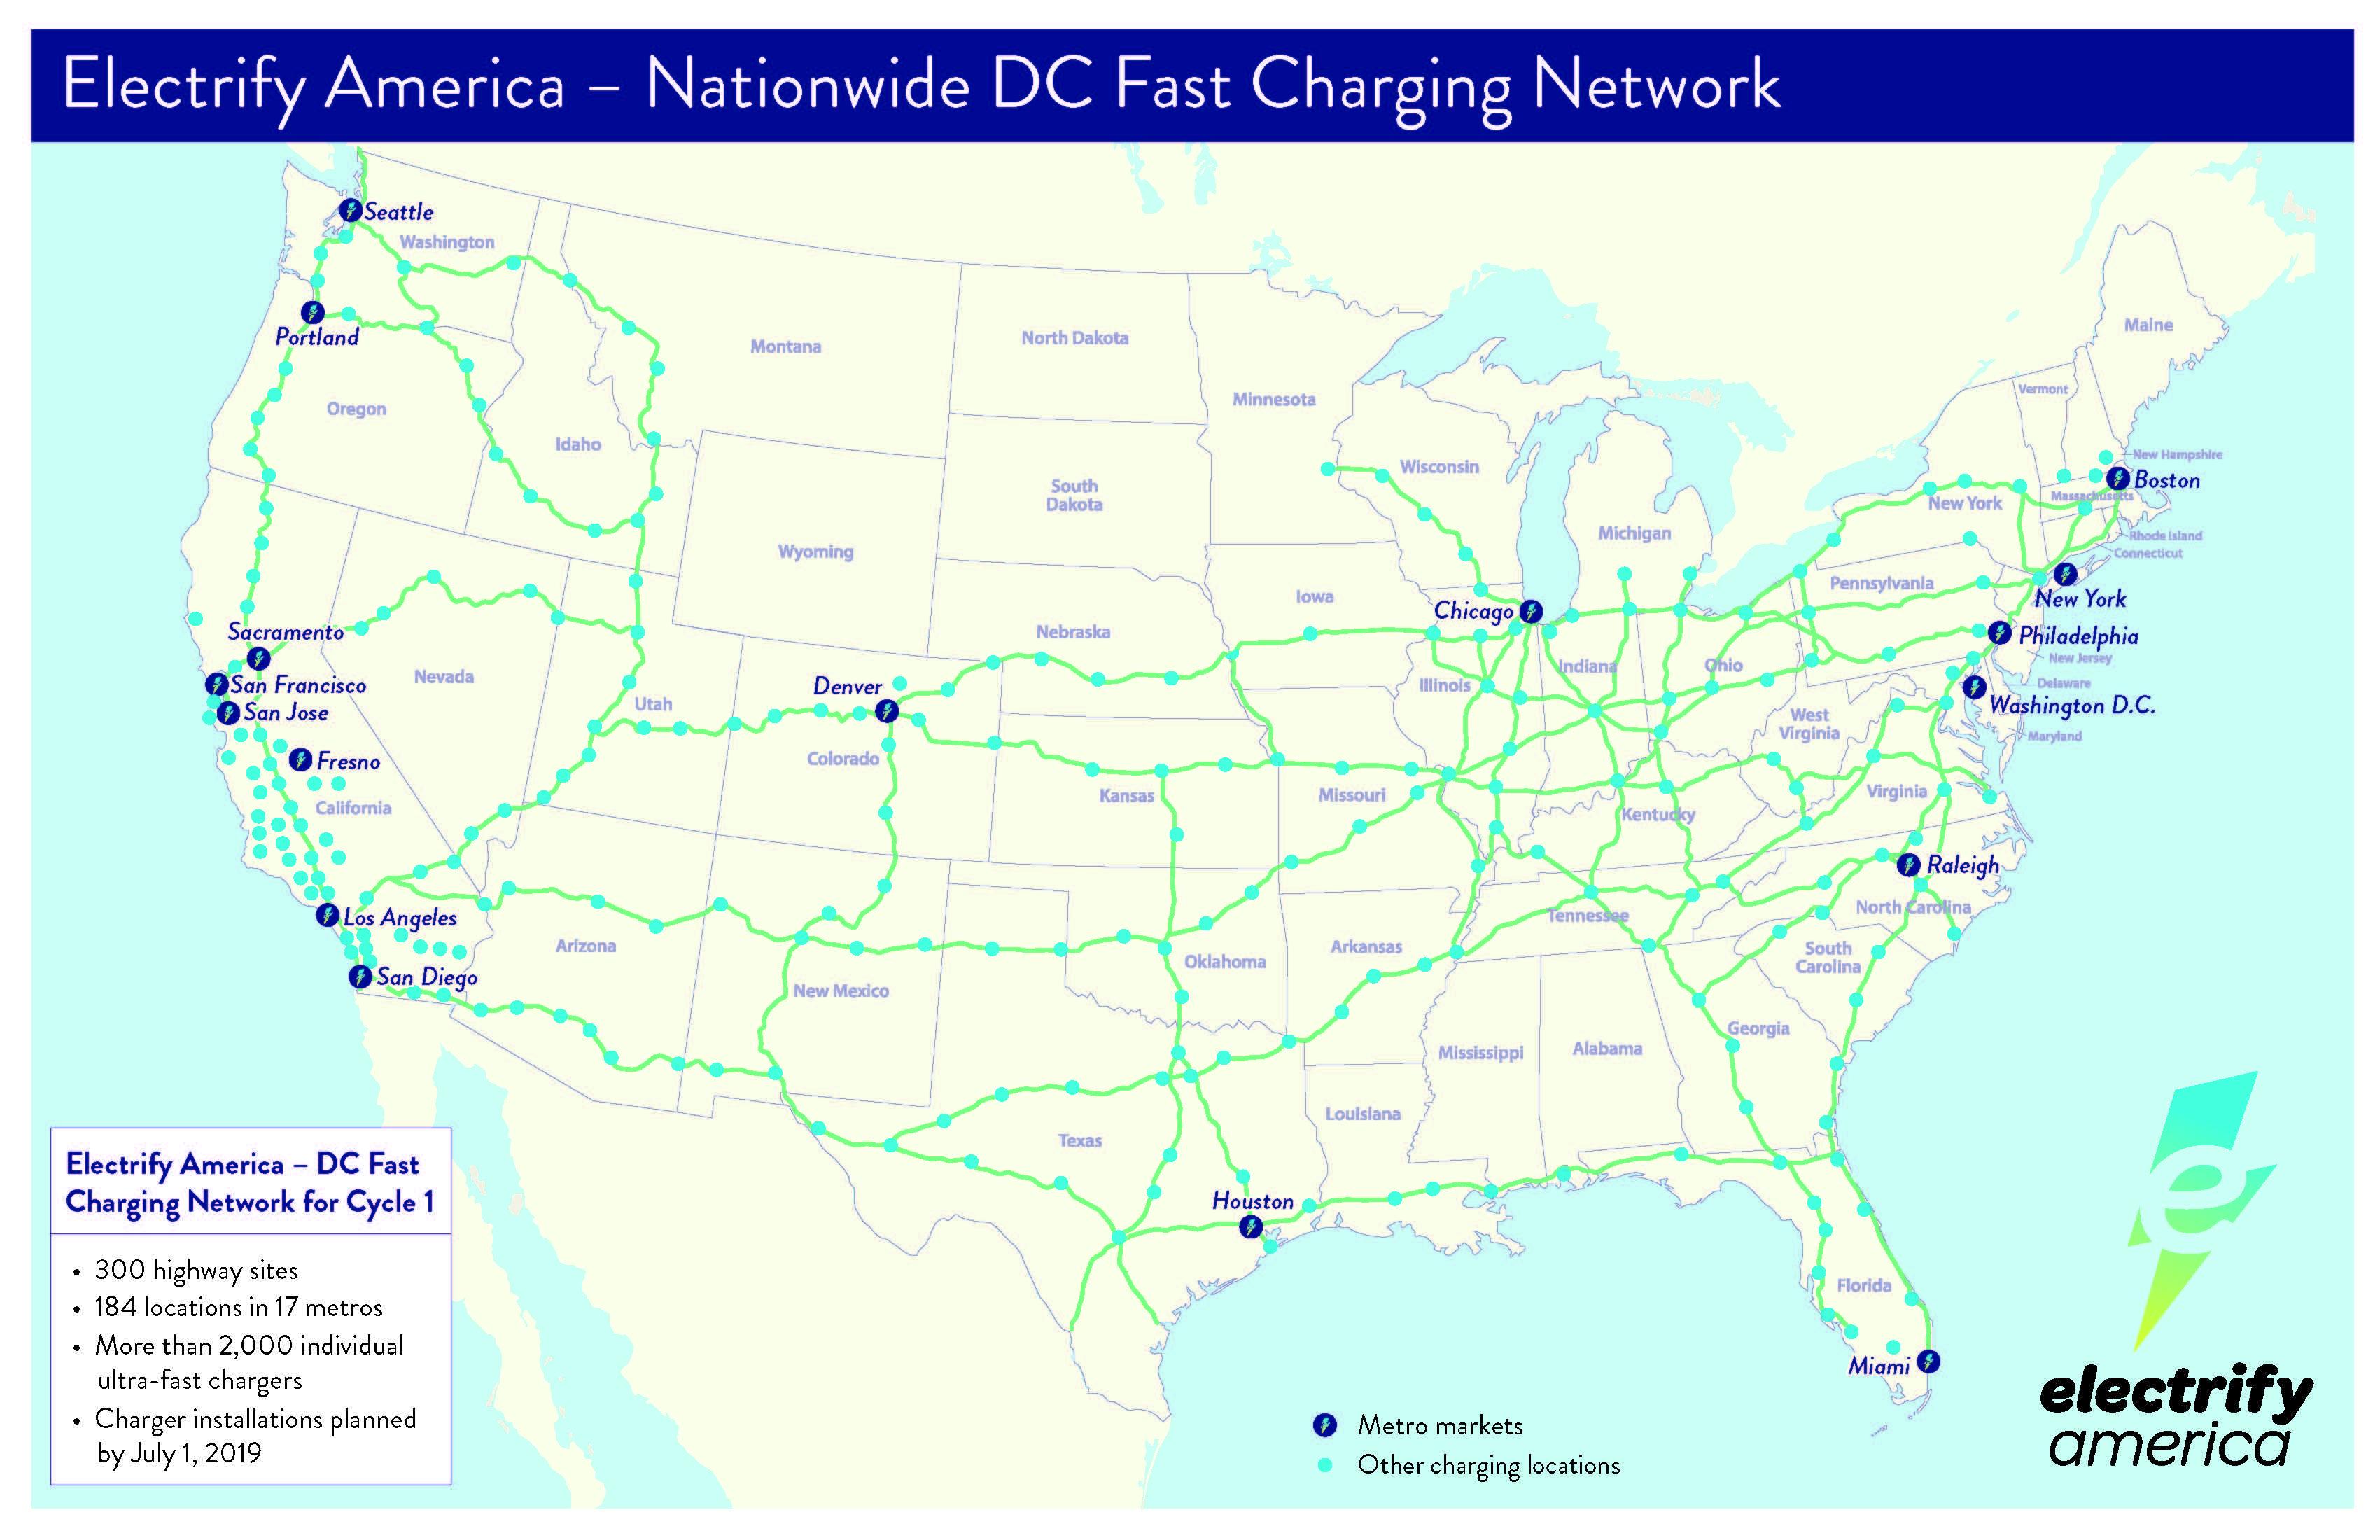 ELECTRIFY_AMERICA_Nationwide Network Map